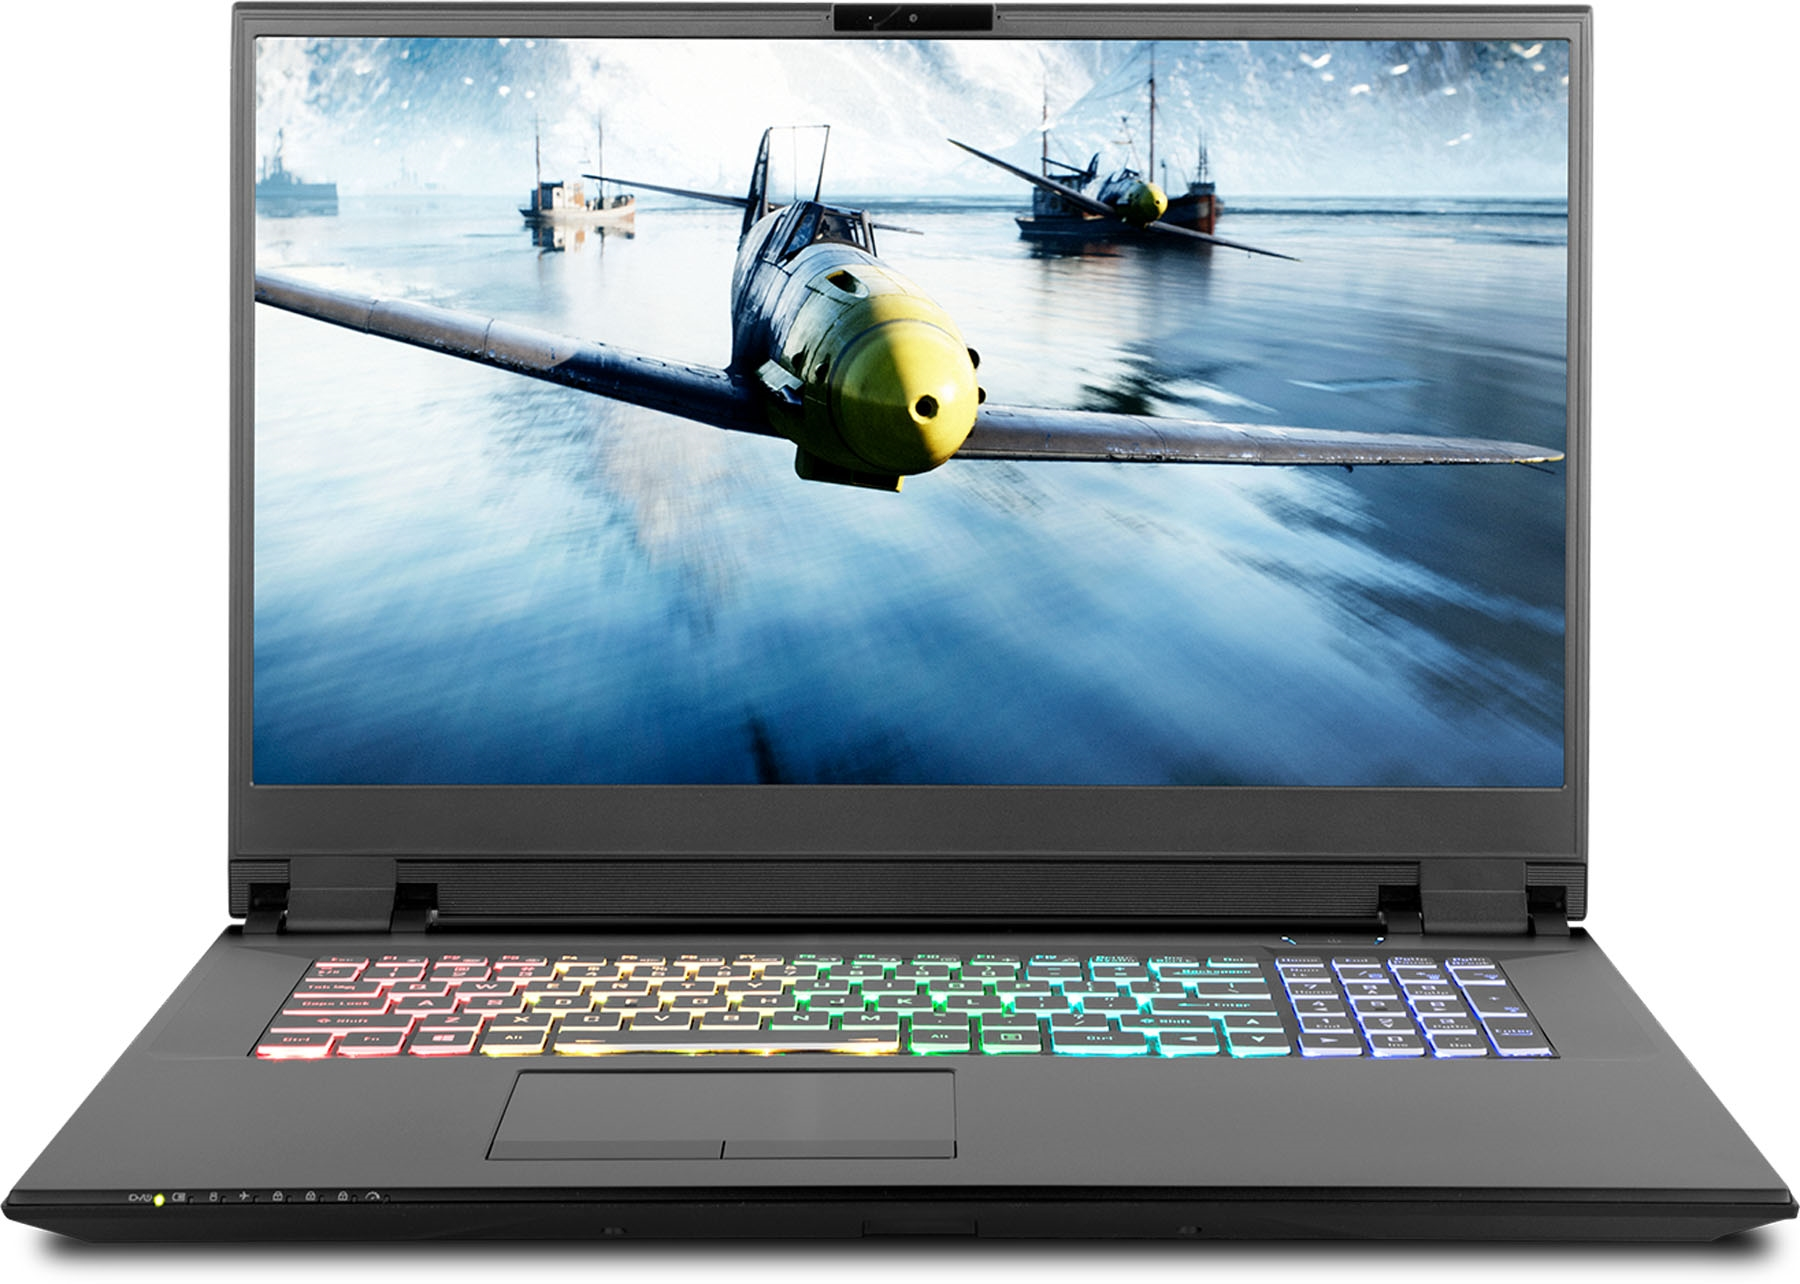 Sager NP8377 (Clevo PB71RF-G) nVidia RTX 2070 8GB, 9th Gen Intel Core  i7-9750H